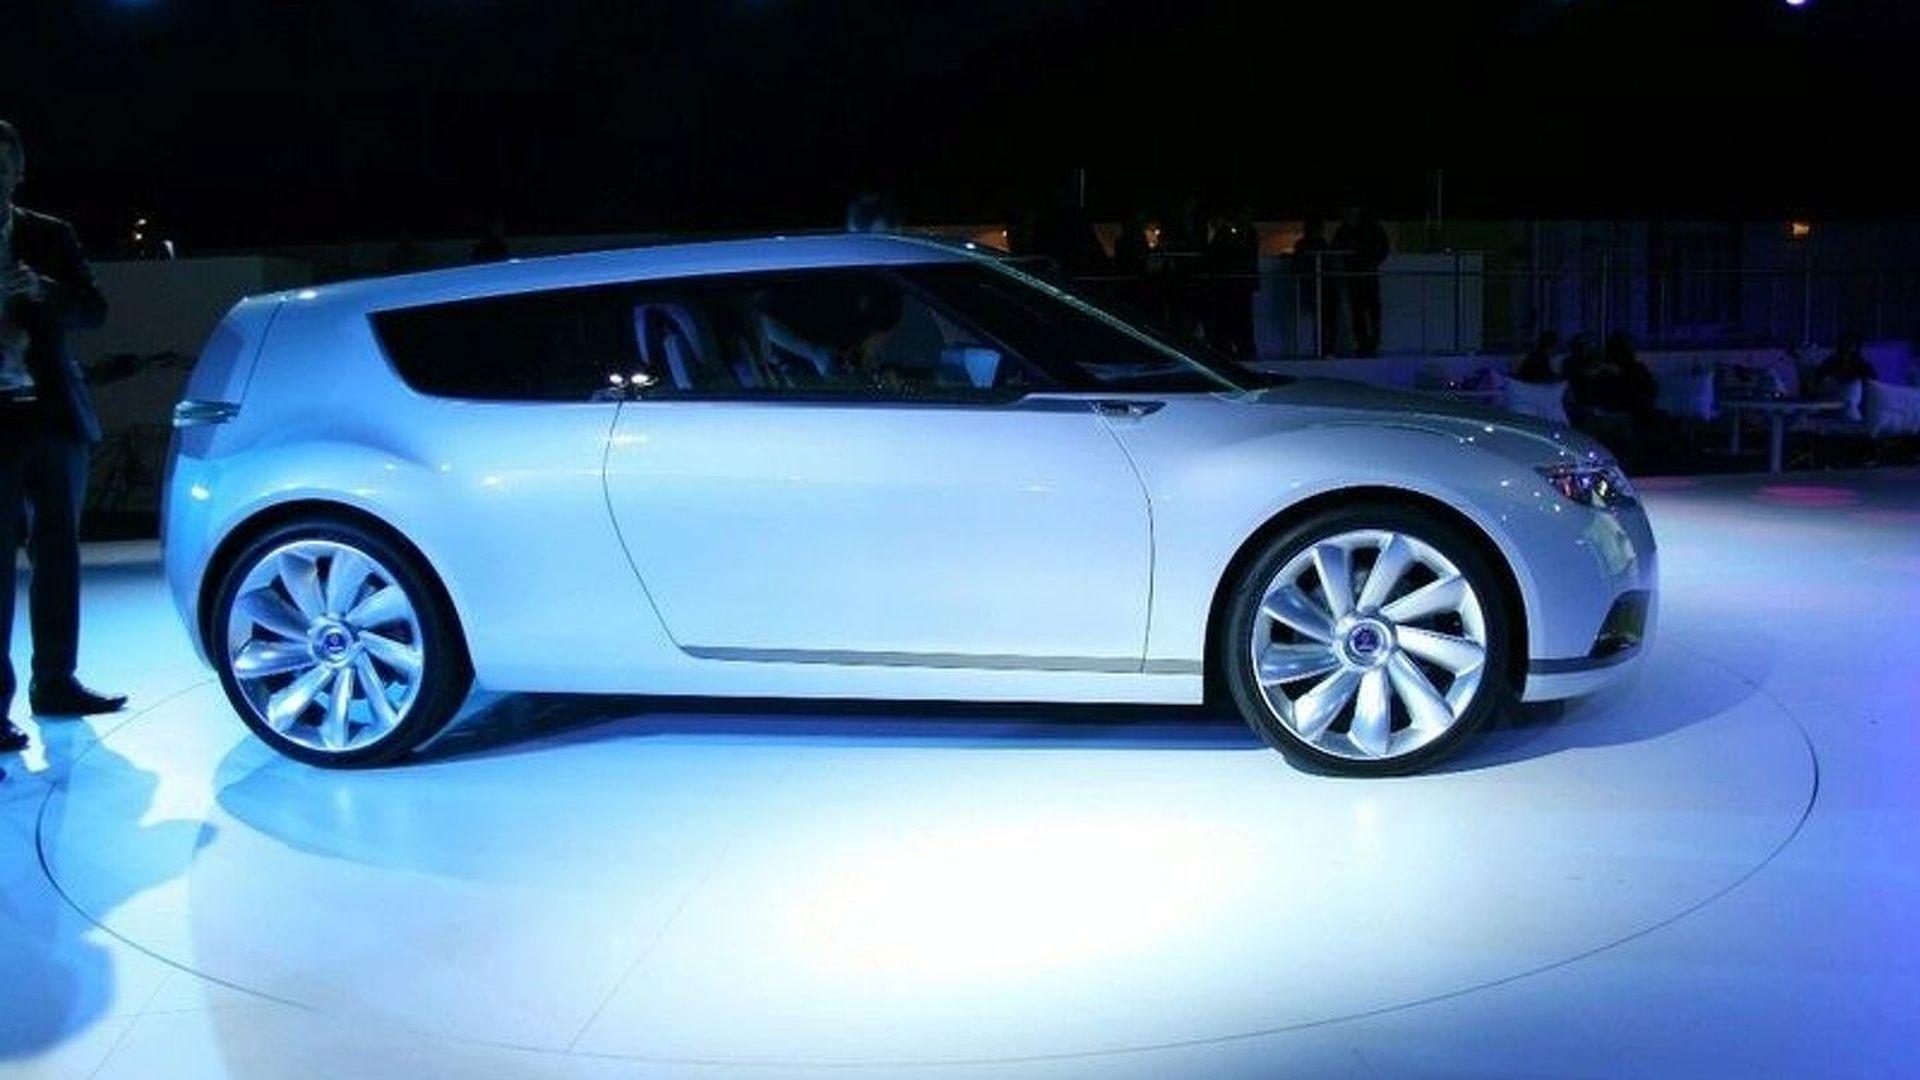 Saab 9-X BioHybrid Voted Best Concept at the Geneva Motor Show